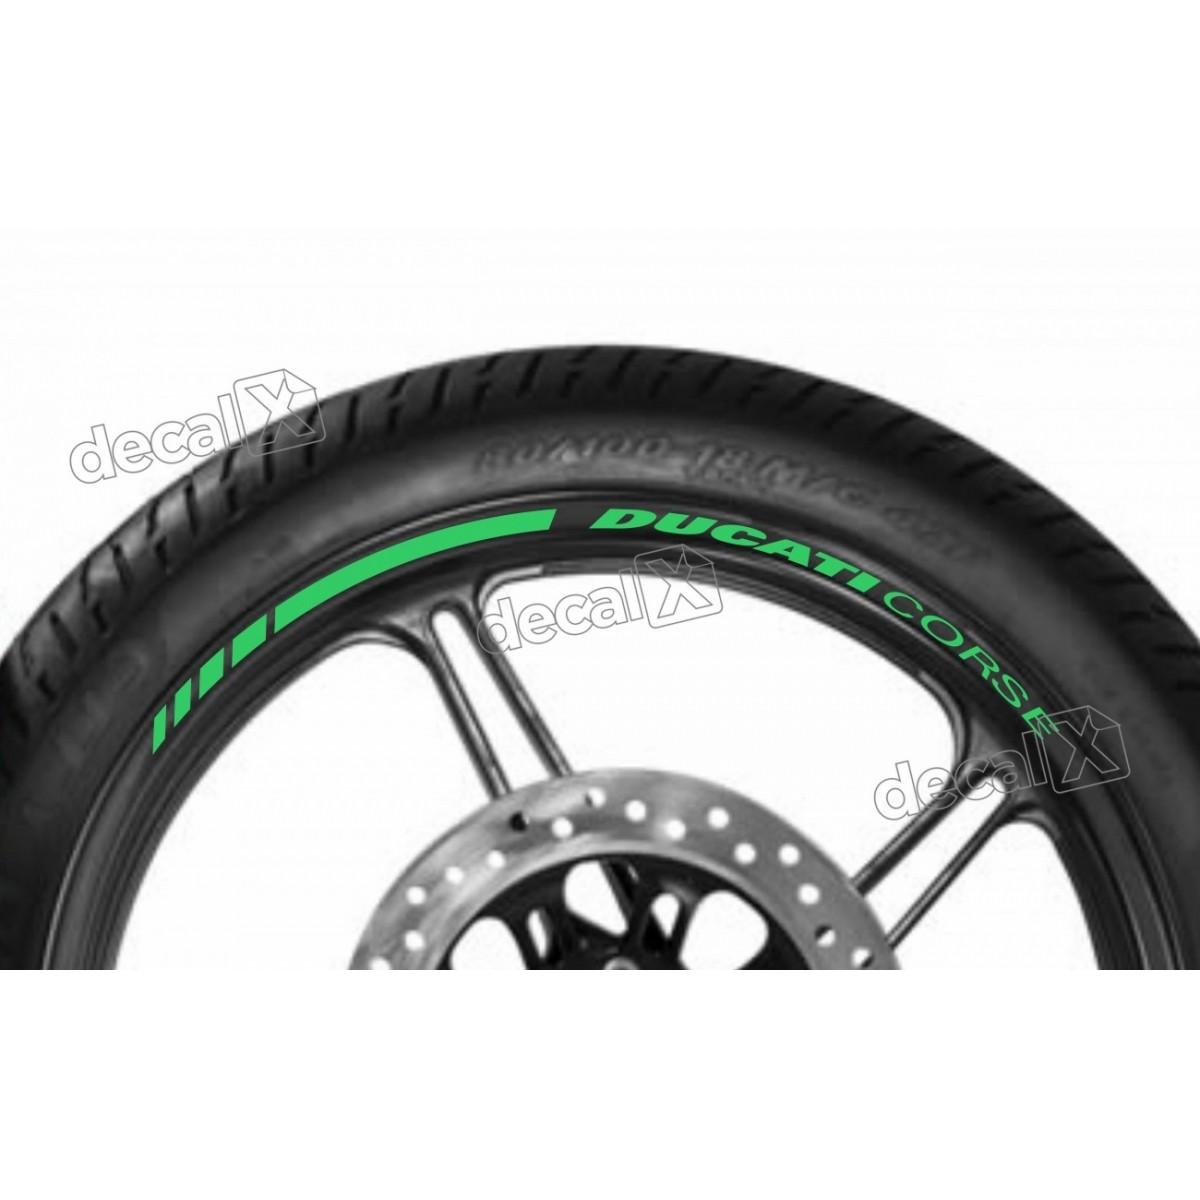 Adesivos Friso Refletivo Roda Moto Ducati Corse Verde